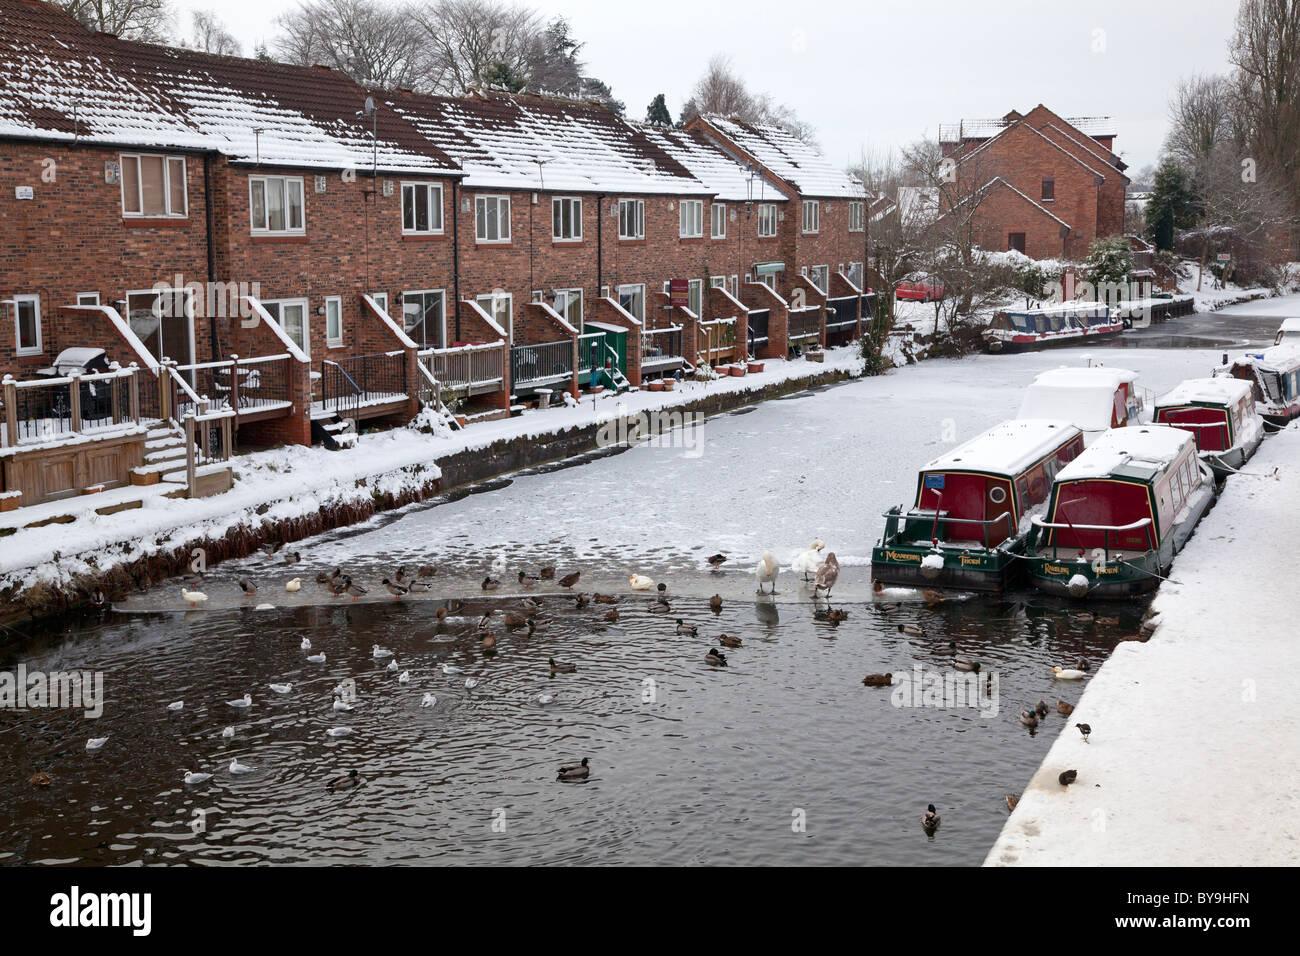 The frozen Bridgewater Canal at Stockton Heath, Cheshire - Stock Image